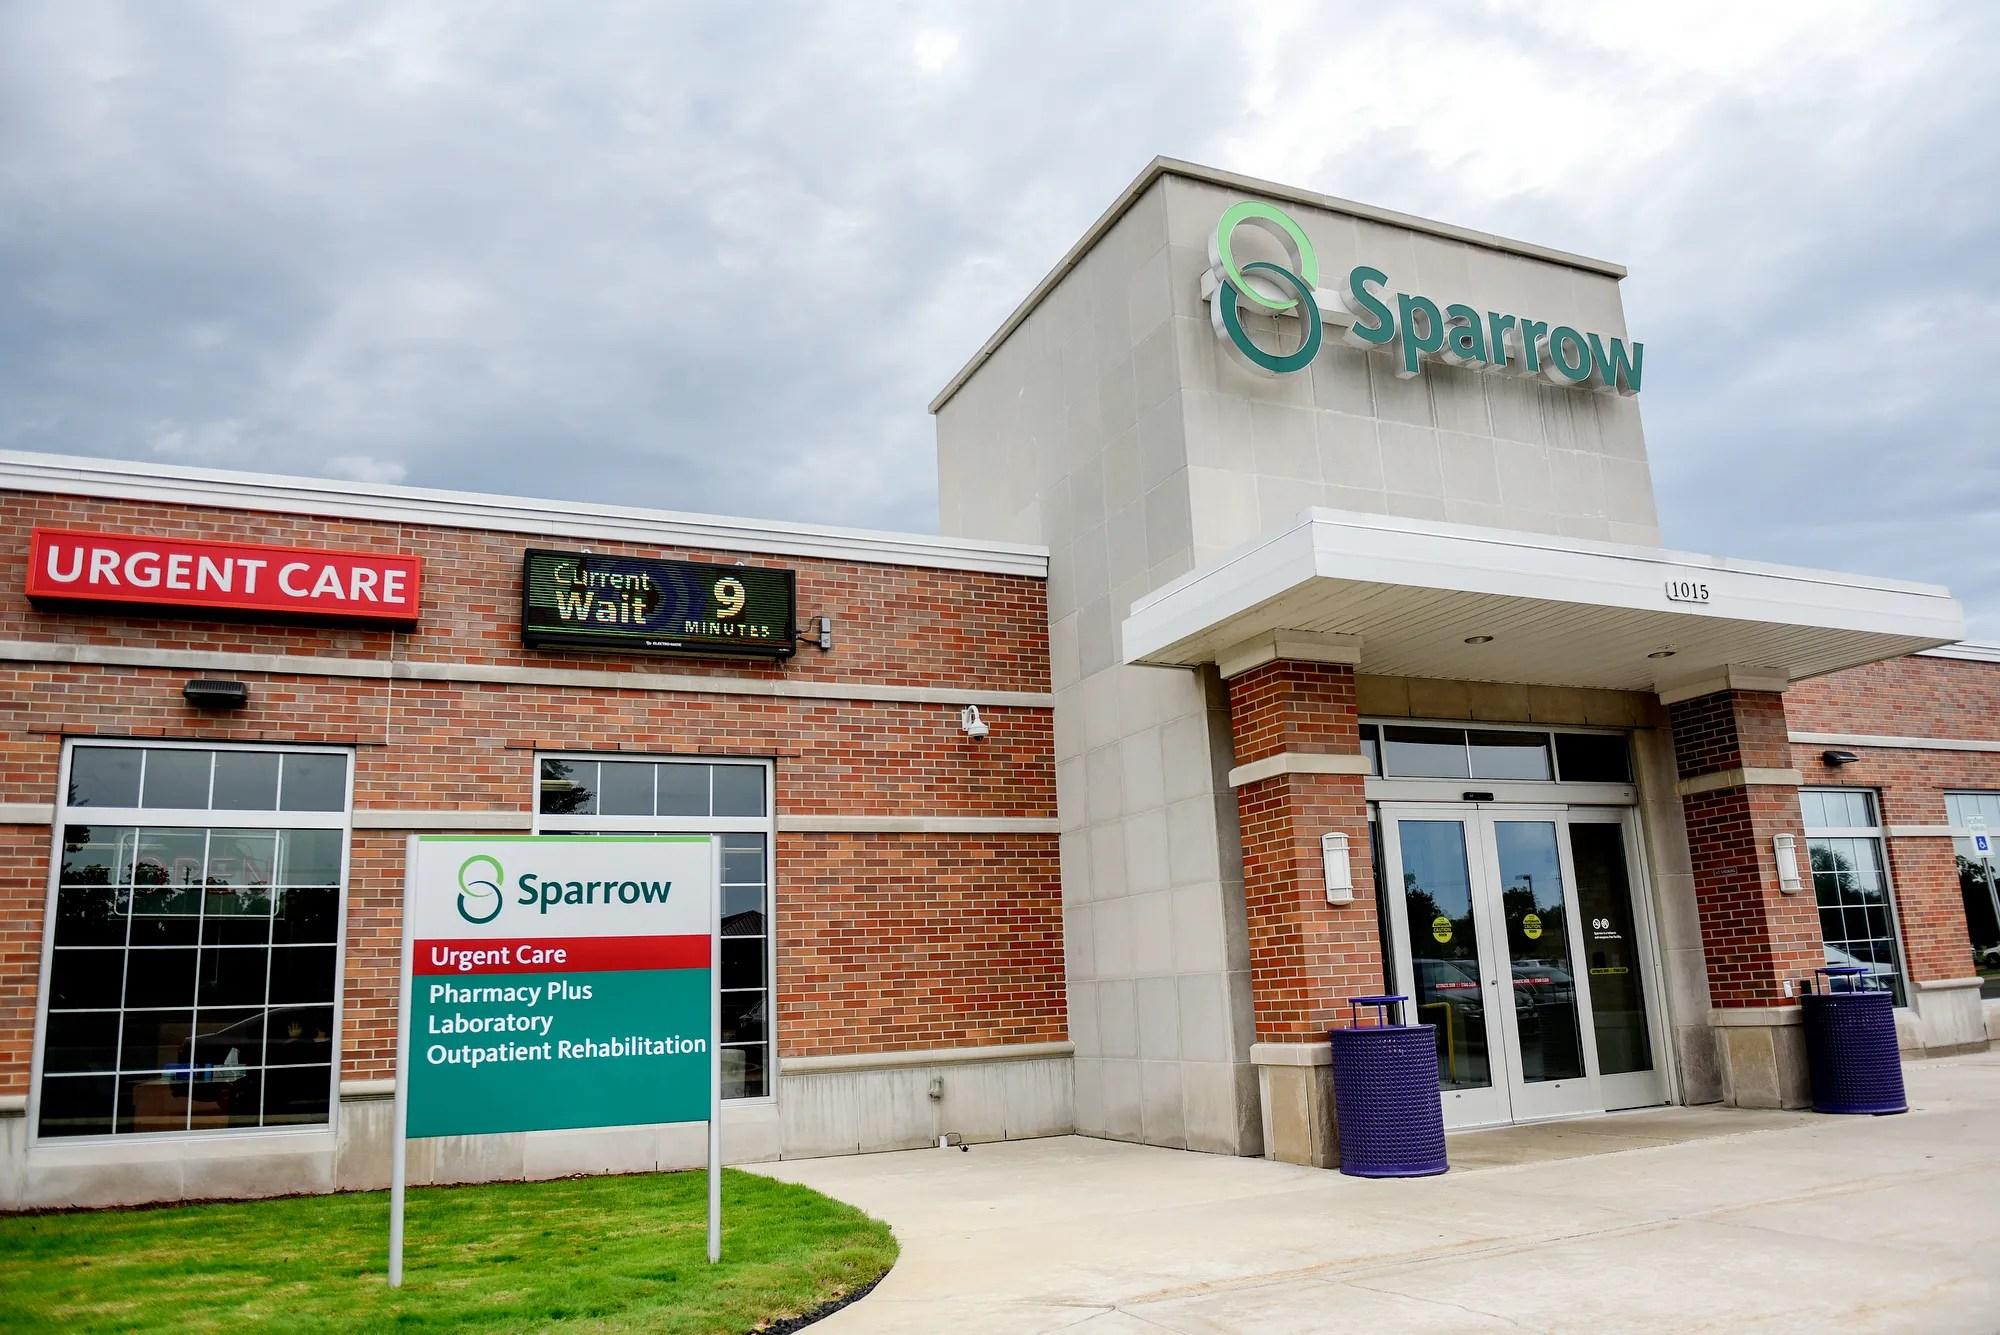 Woman said Sparrow Urgent Care staff denied her care